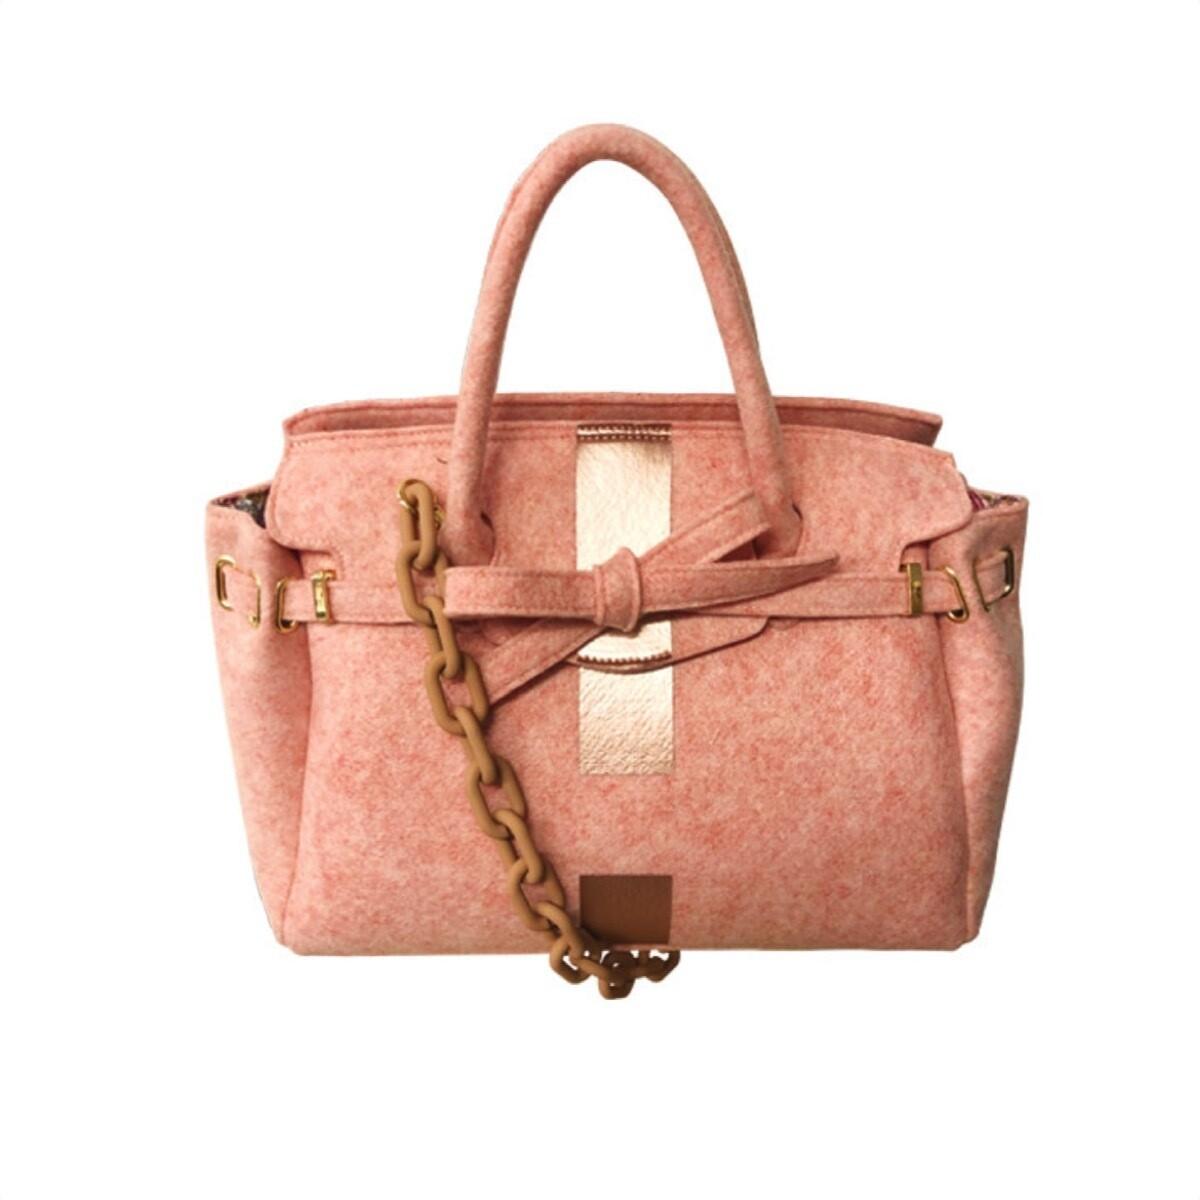 MIA BAG - Due Manici Recycle - Rosa